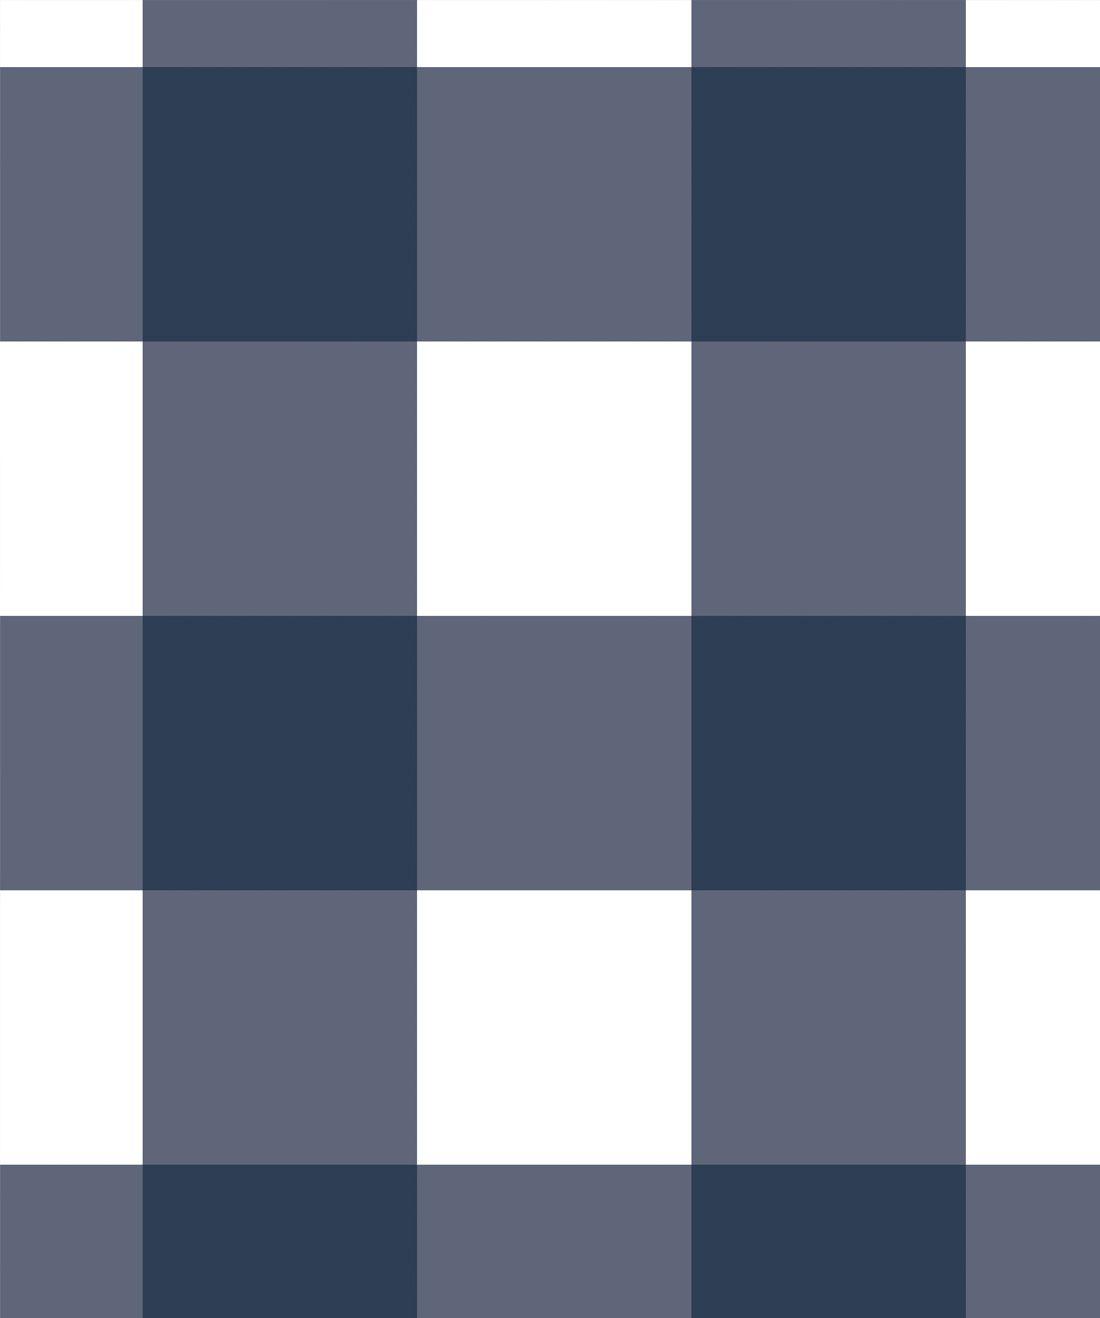 Mel's Buffalo Check Wallpaper • Navy Blue Plaid Wallpaper Swatch